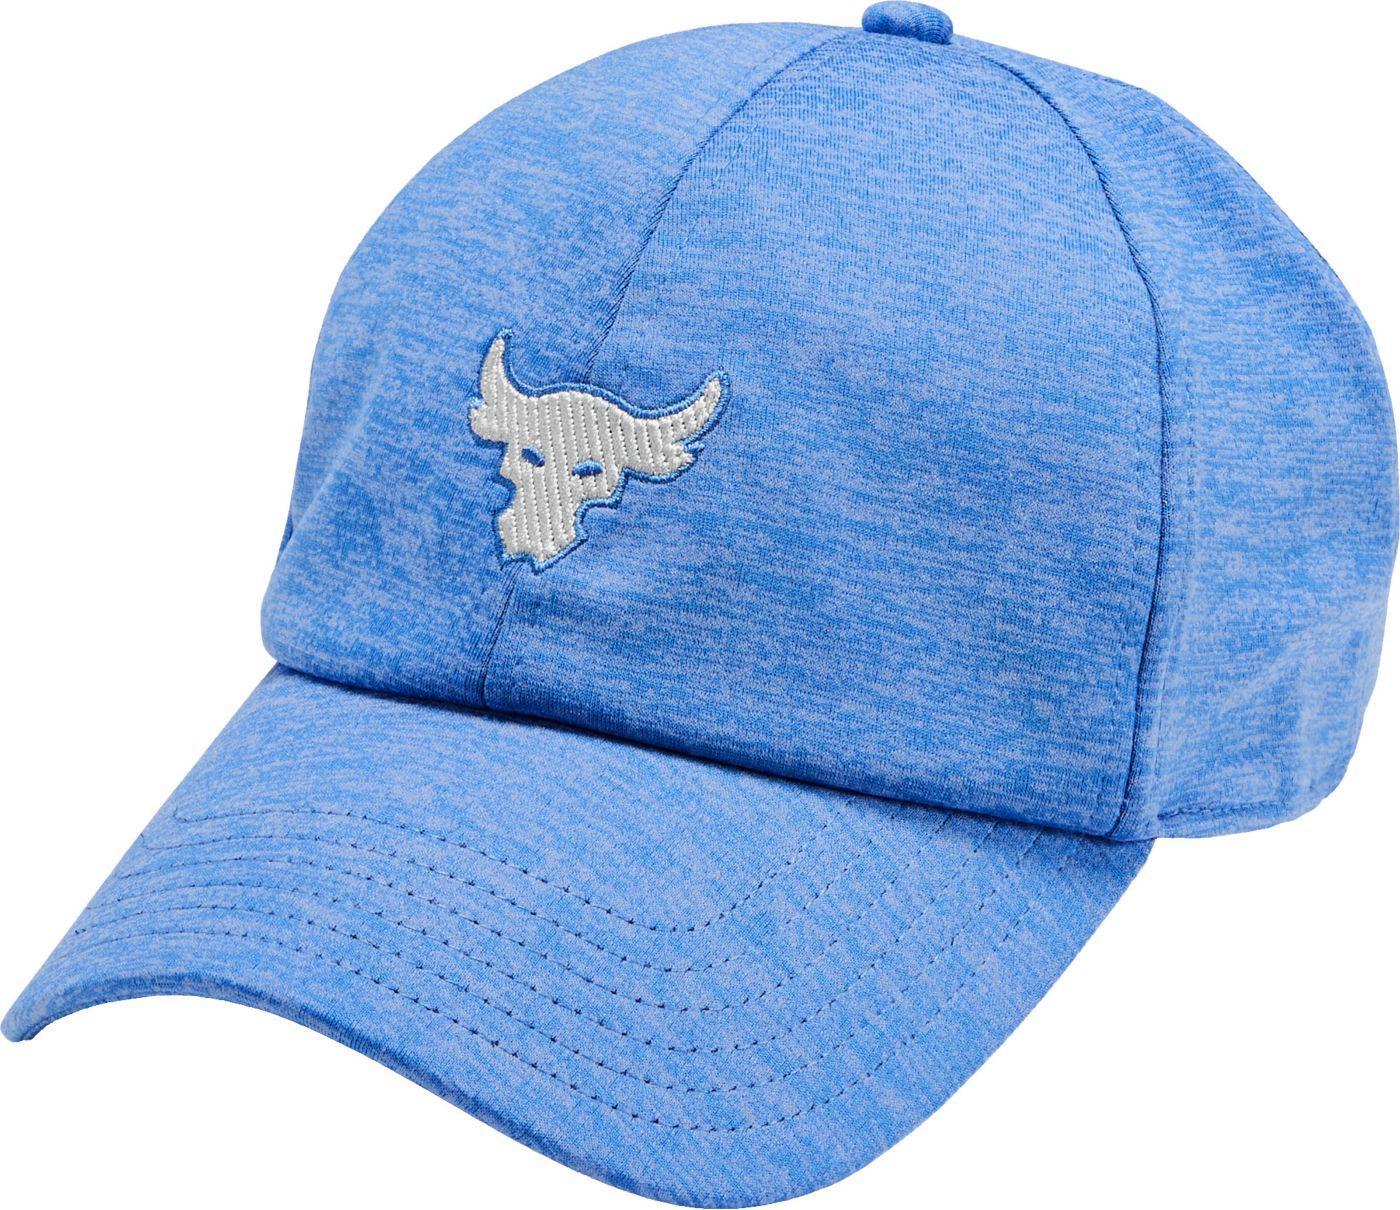 Under Armour Women's Project Rock Renegade Hat